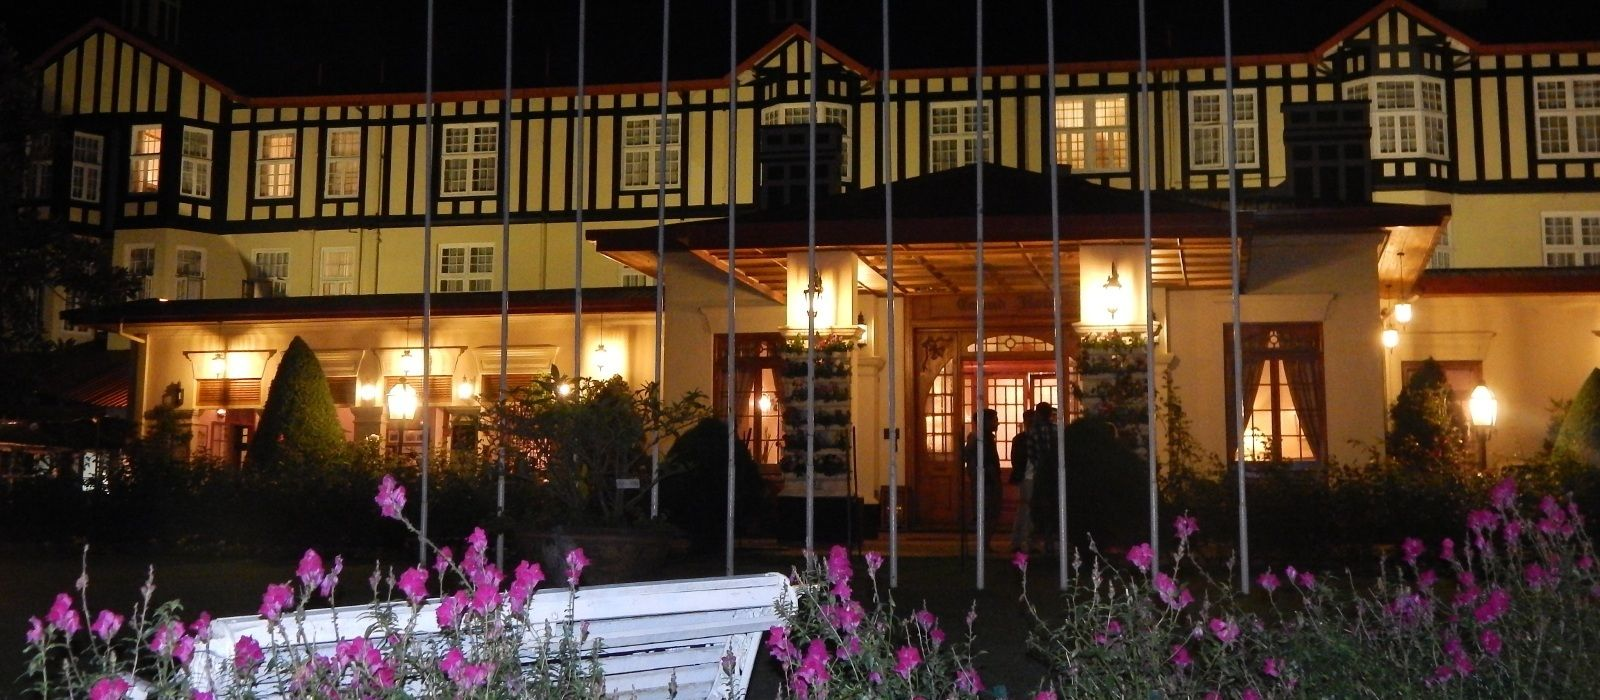 Grand hotel enchanting travels - Grand hotel sri lanka ...